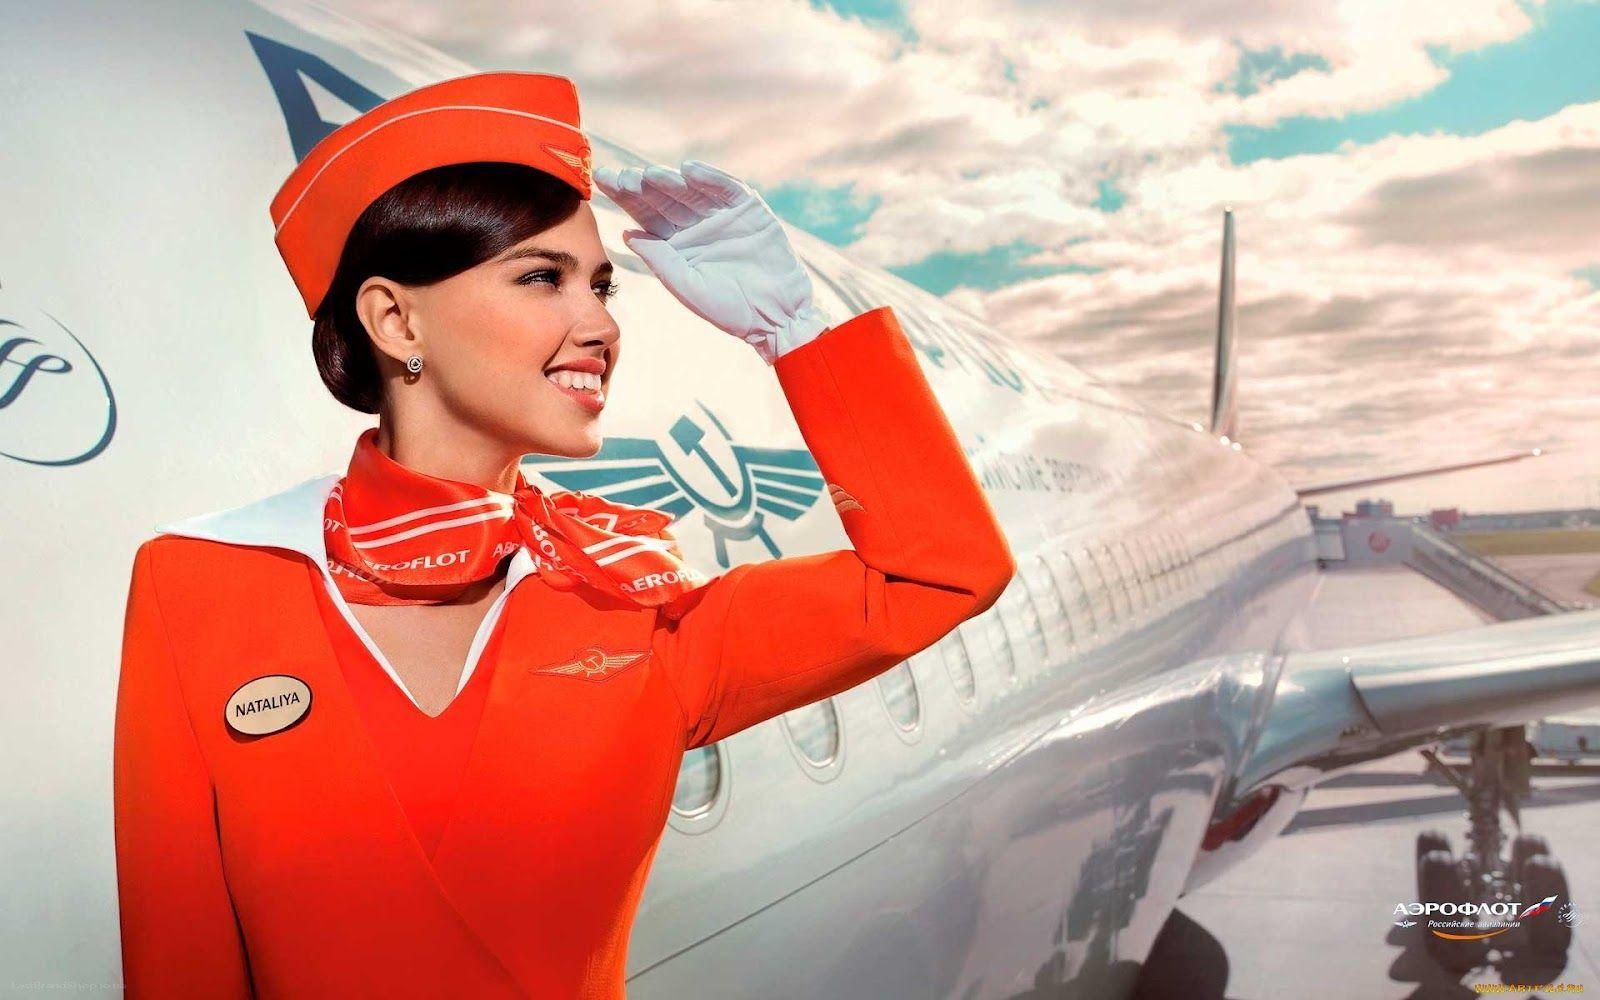 aeroflot attendant Aeroflot Stewardess